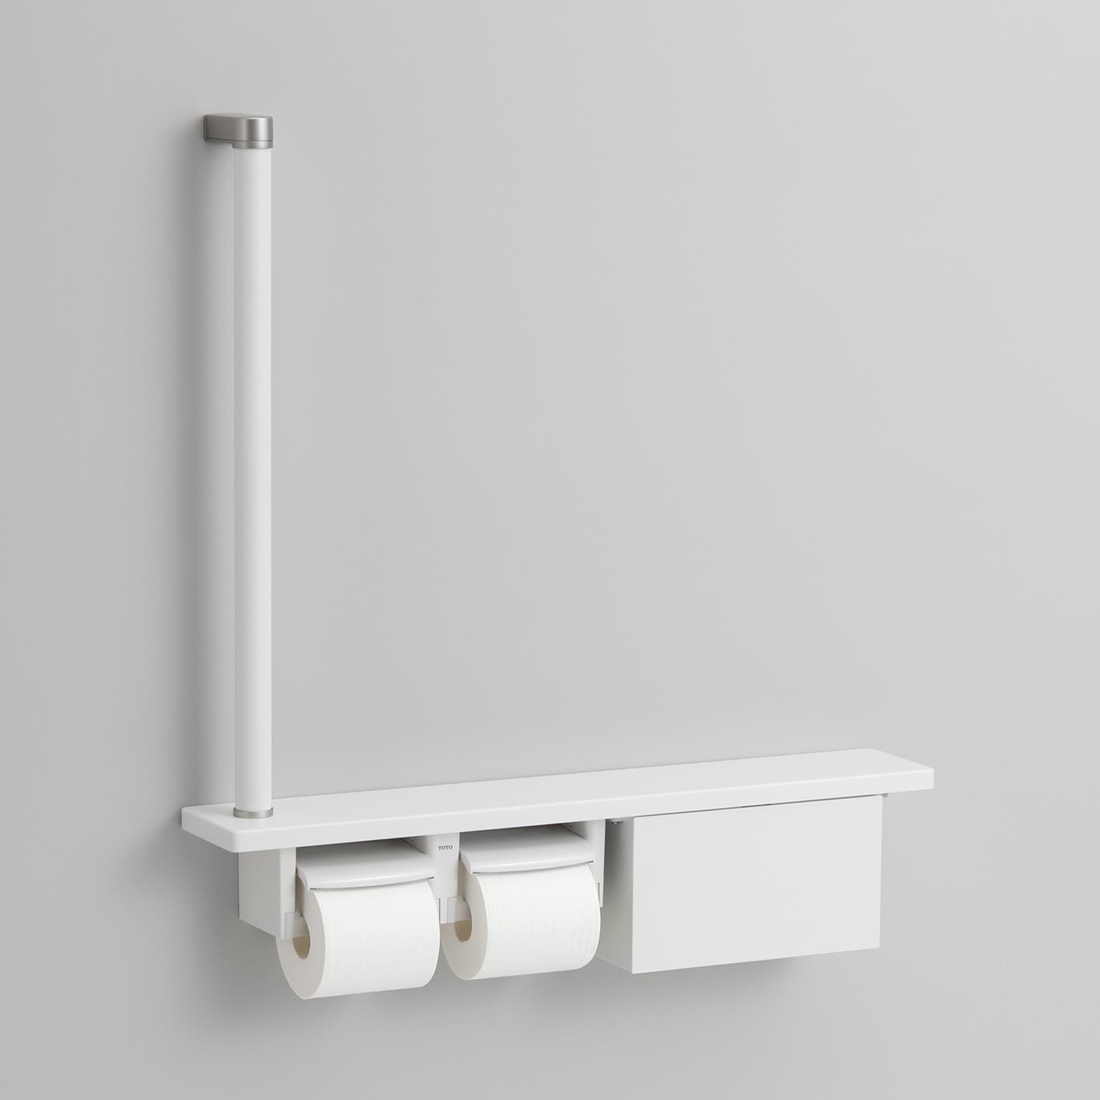 TOTO 紙巻器一体型 木製手すり 収納付 受賞店 棚一体タイプ [並行輸入品] YHB63FB